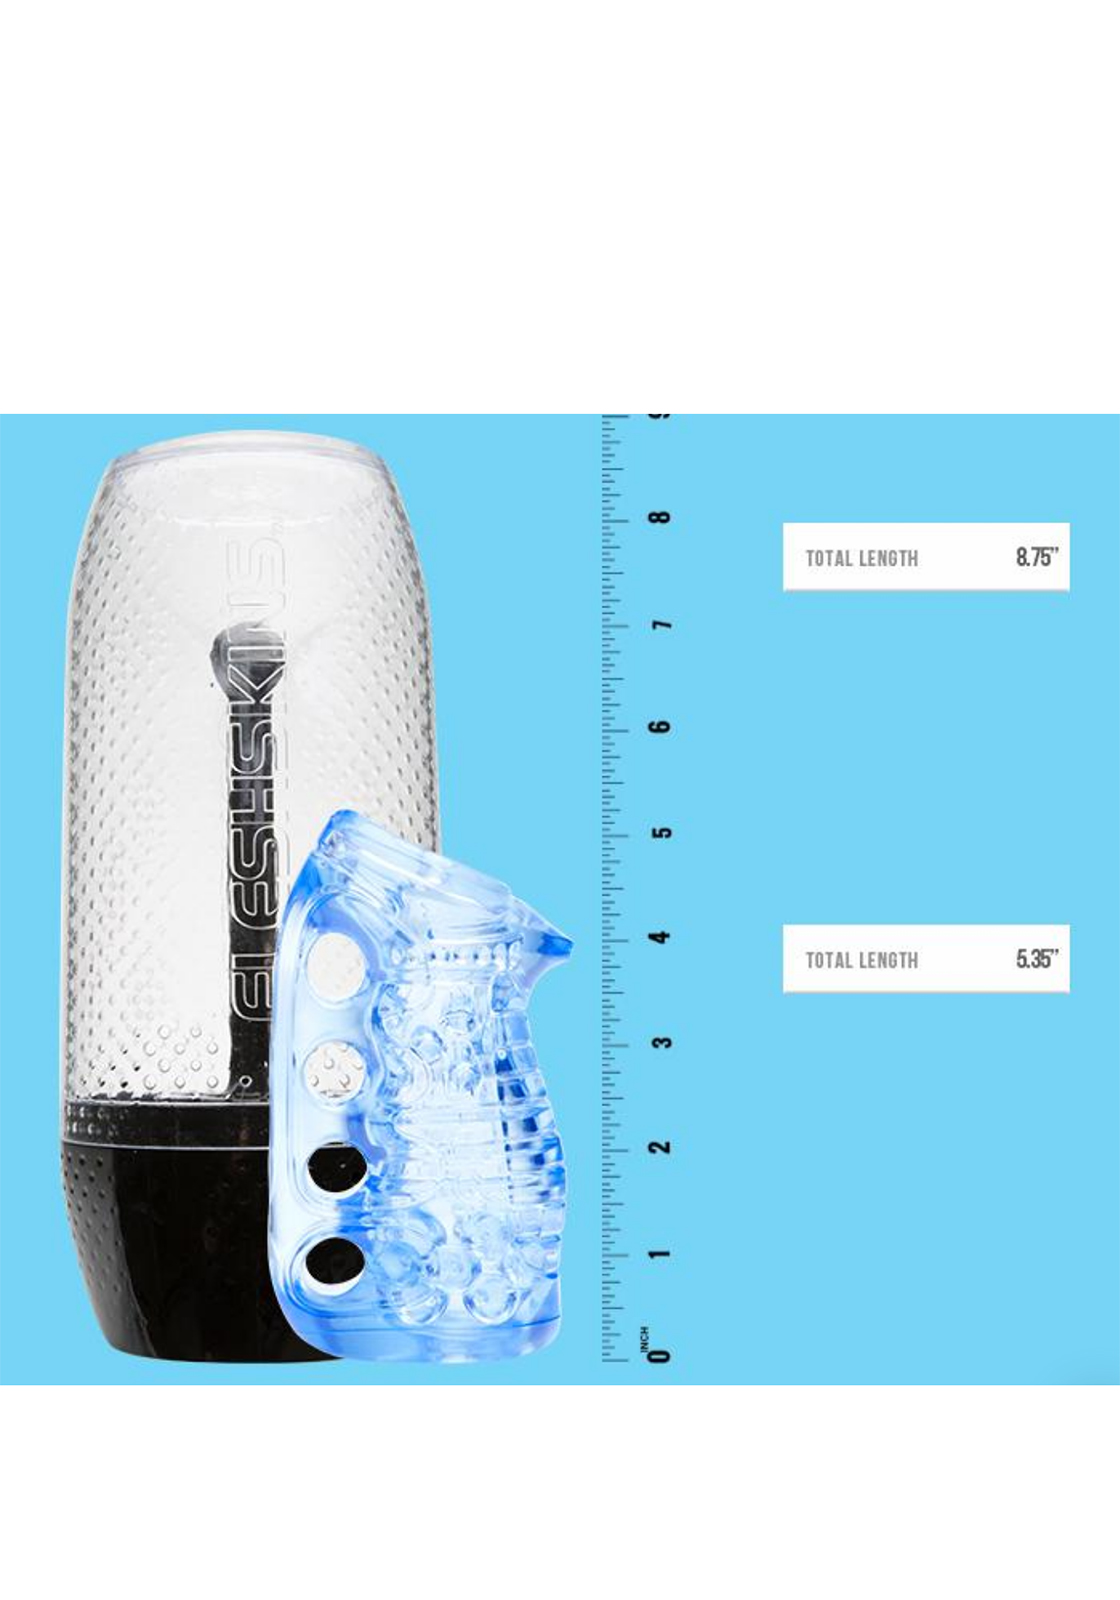 Fleshlight Fleshskins Grip Masturbator (clear blue ice)